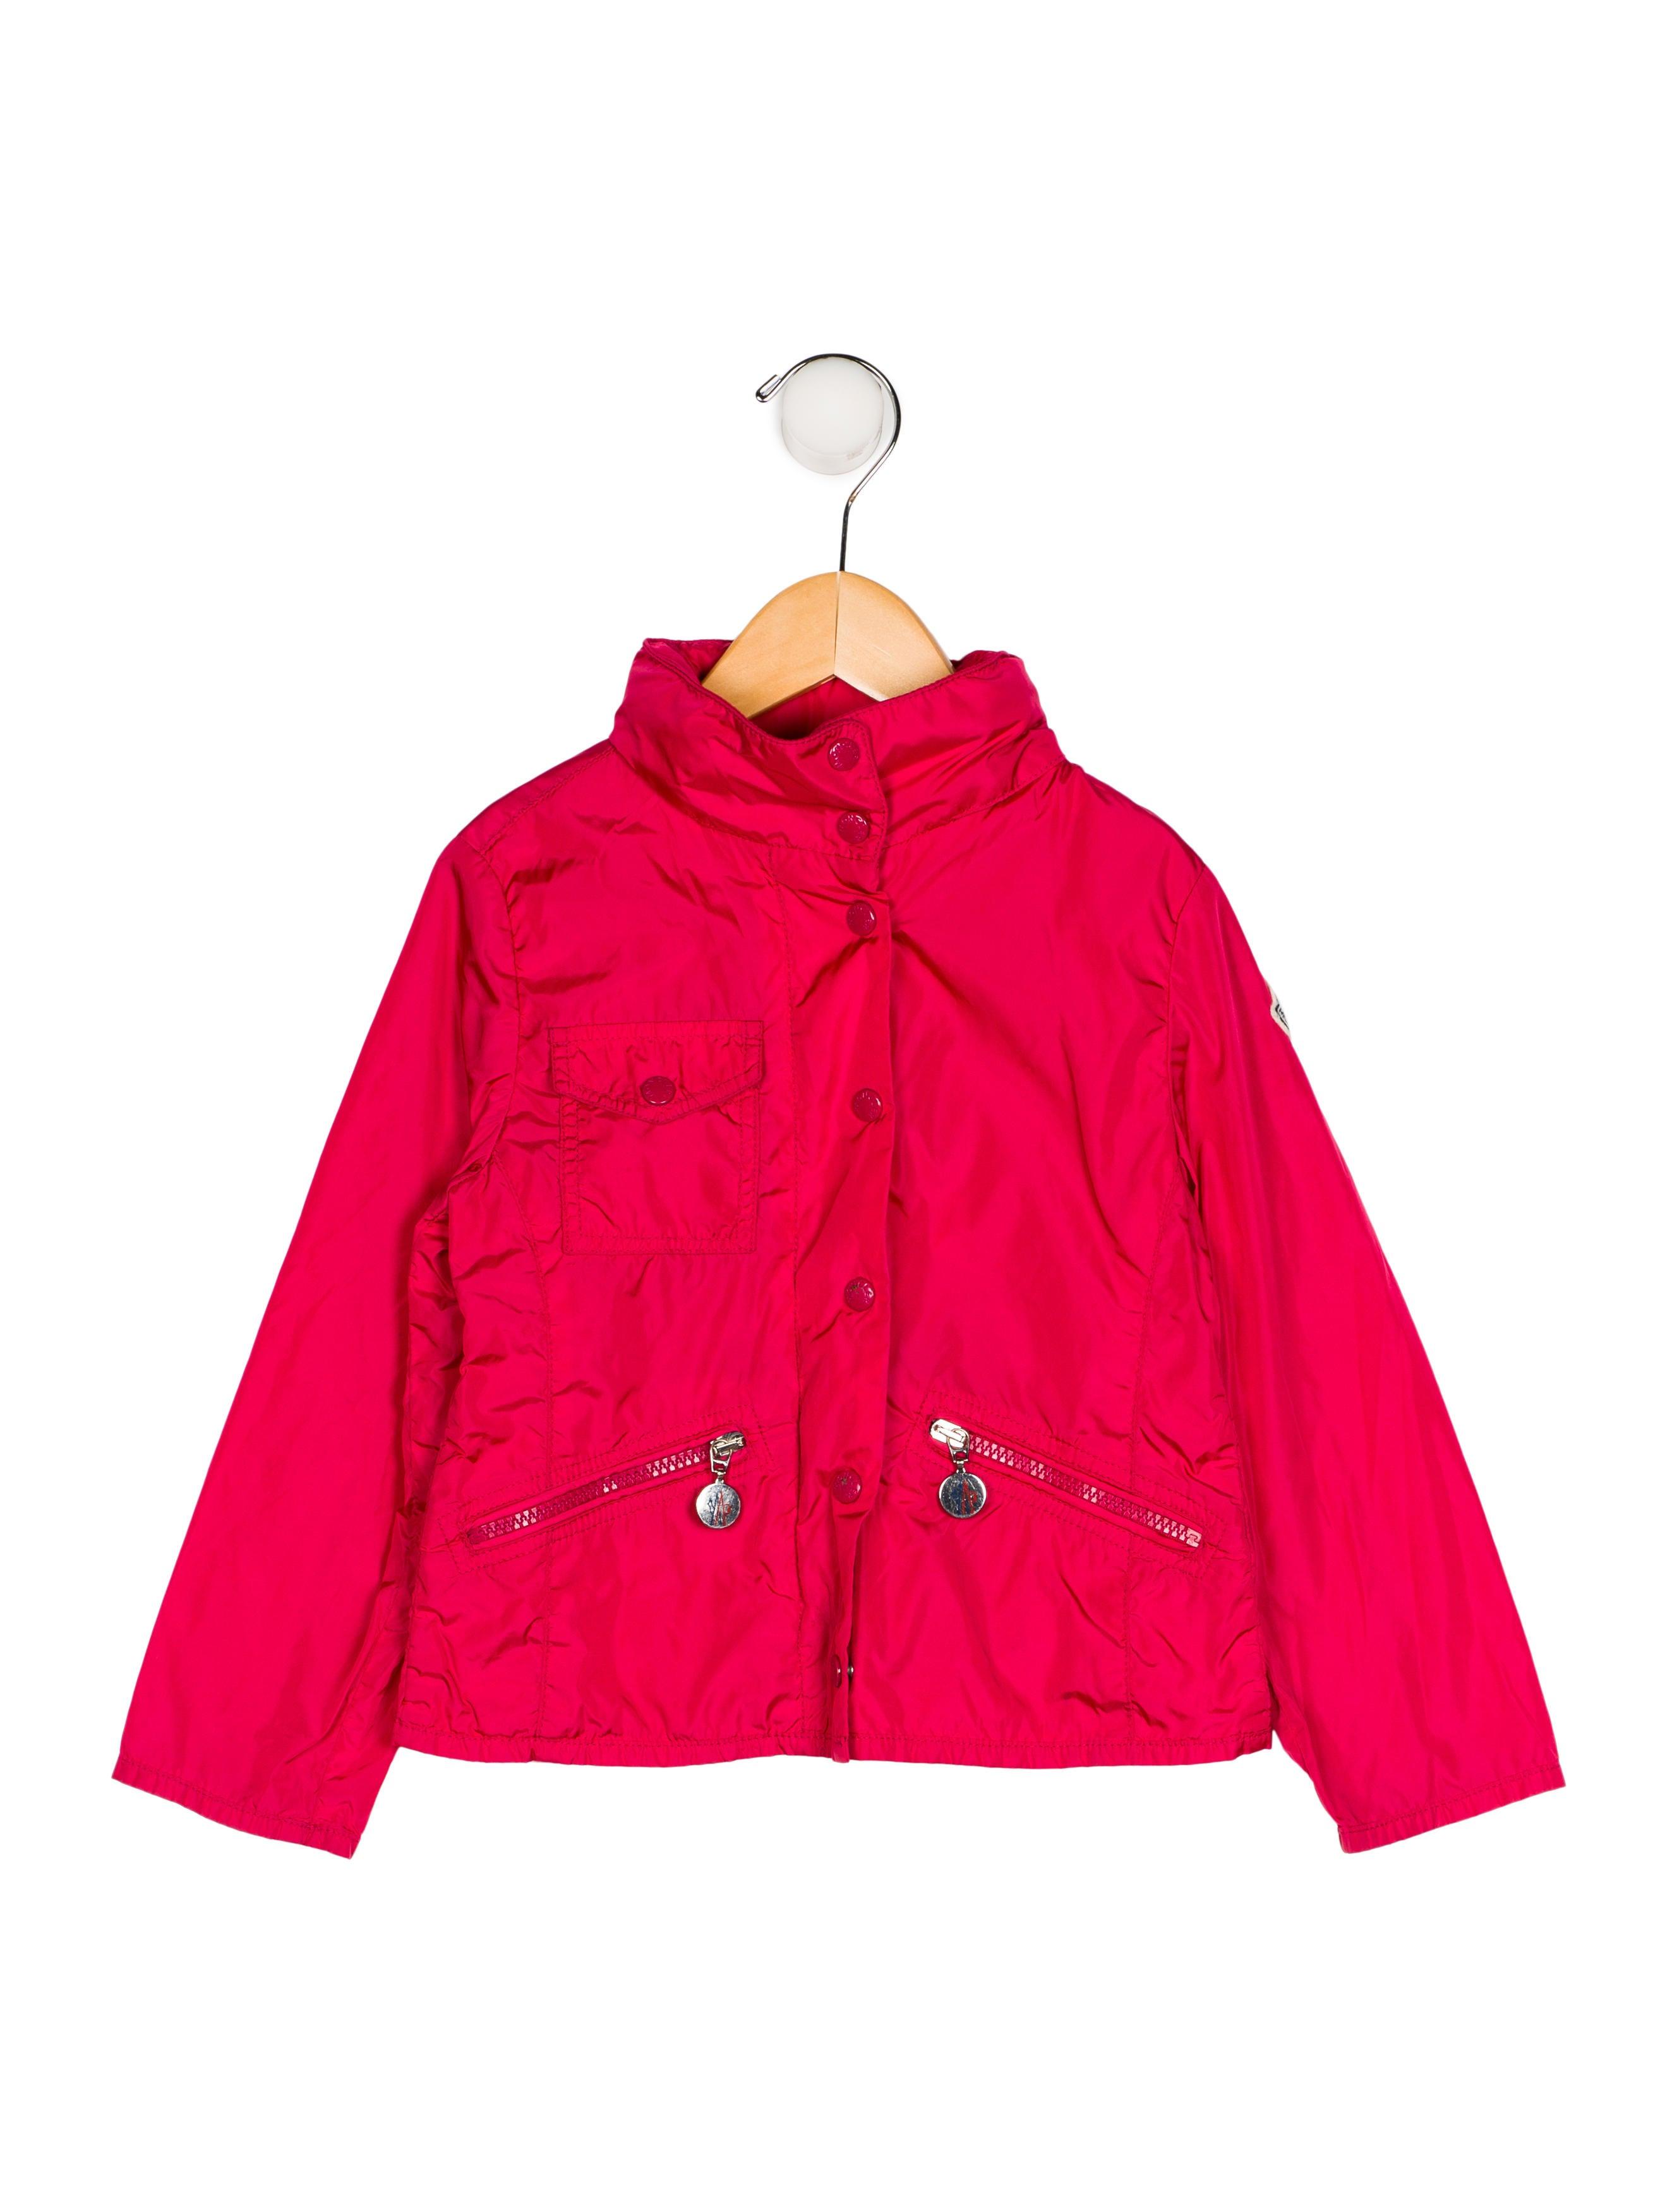 4f027fe0c Moncler Girls  Three Pocket Lightweight Jacket - Girls - MOC28453 ...